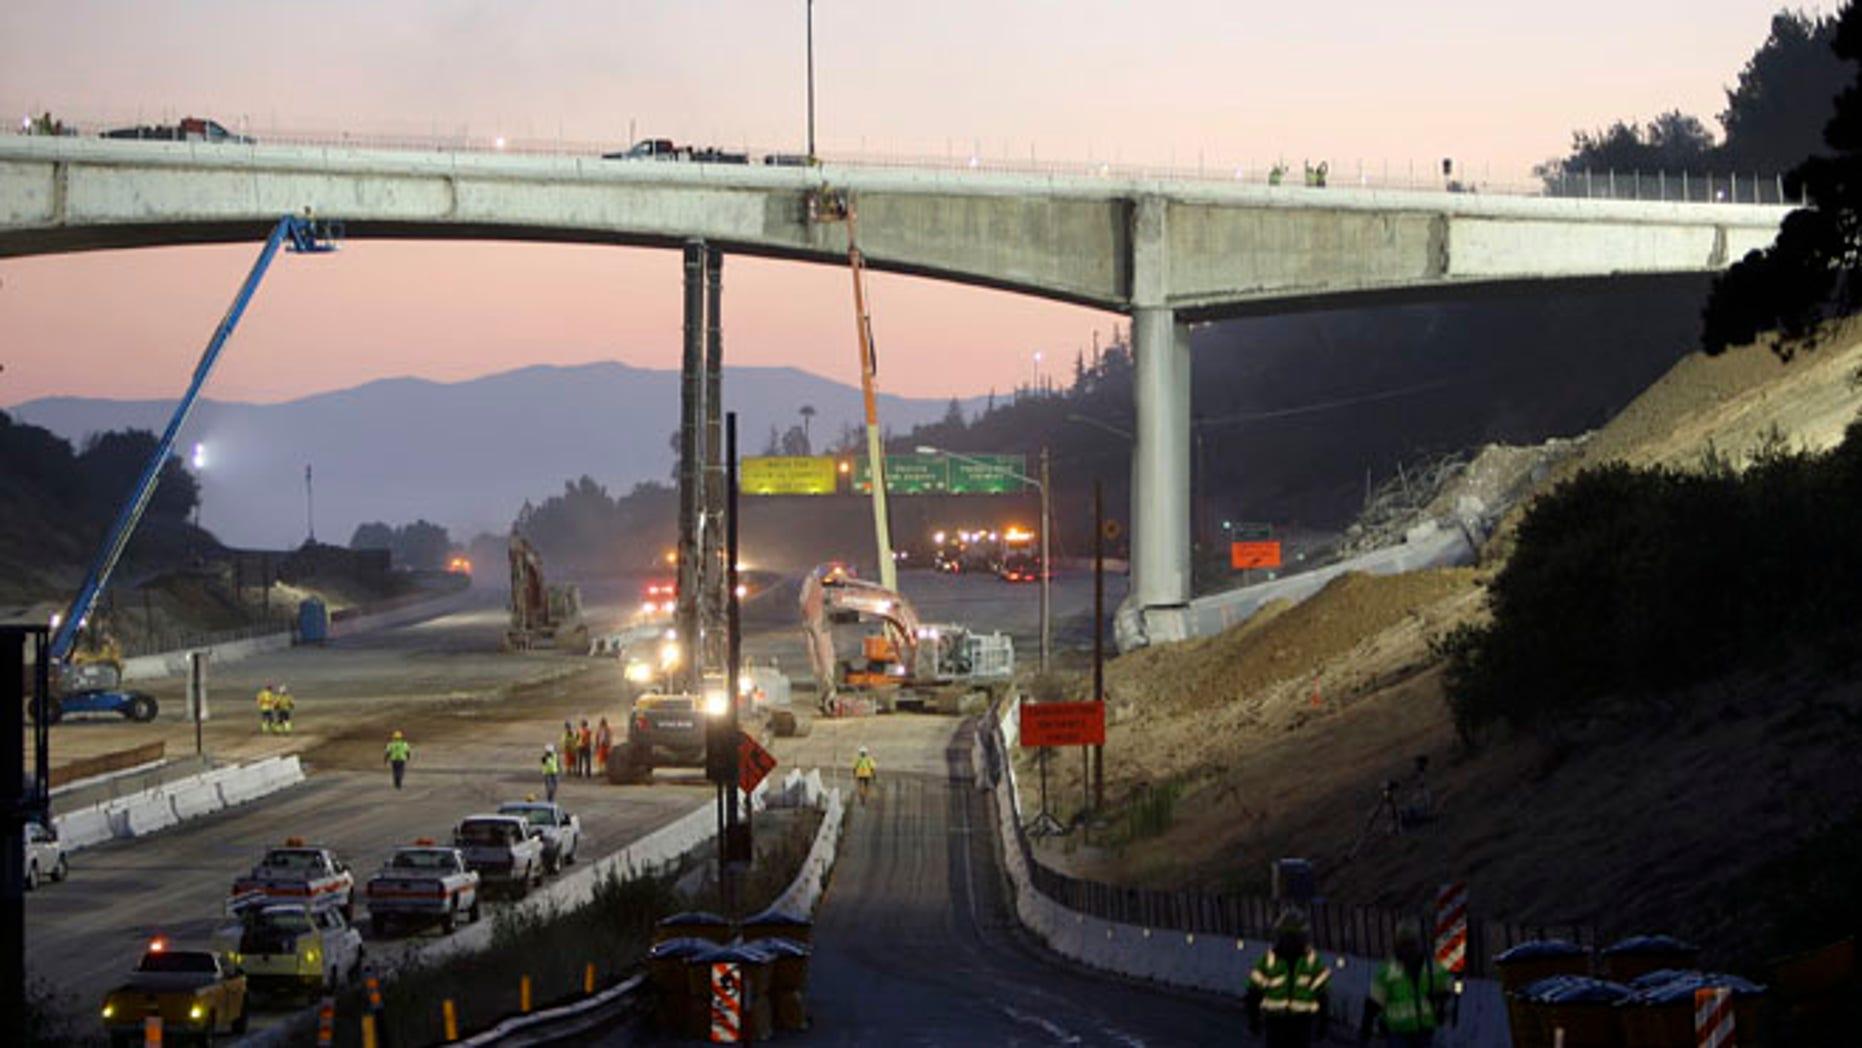 FILE: 2011: Workers demolish the Mulholland Drive bridge across the 405 freeway in Los Angeles, Calif.